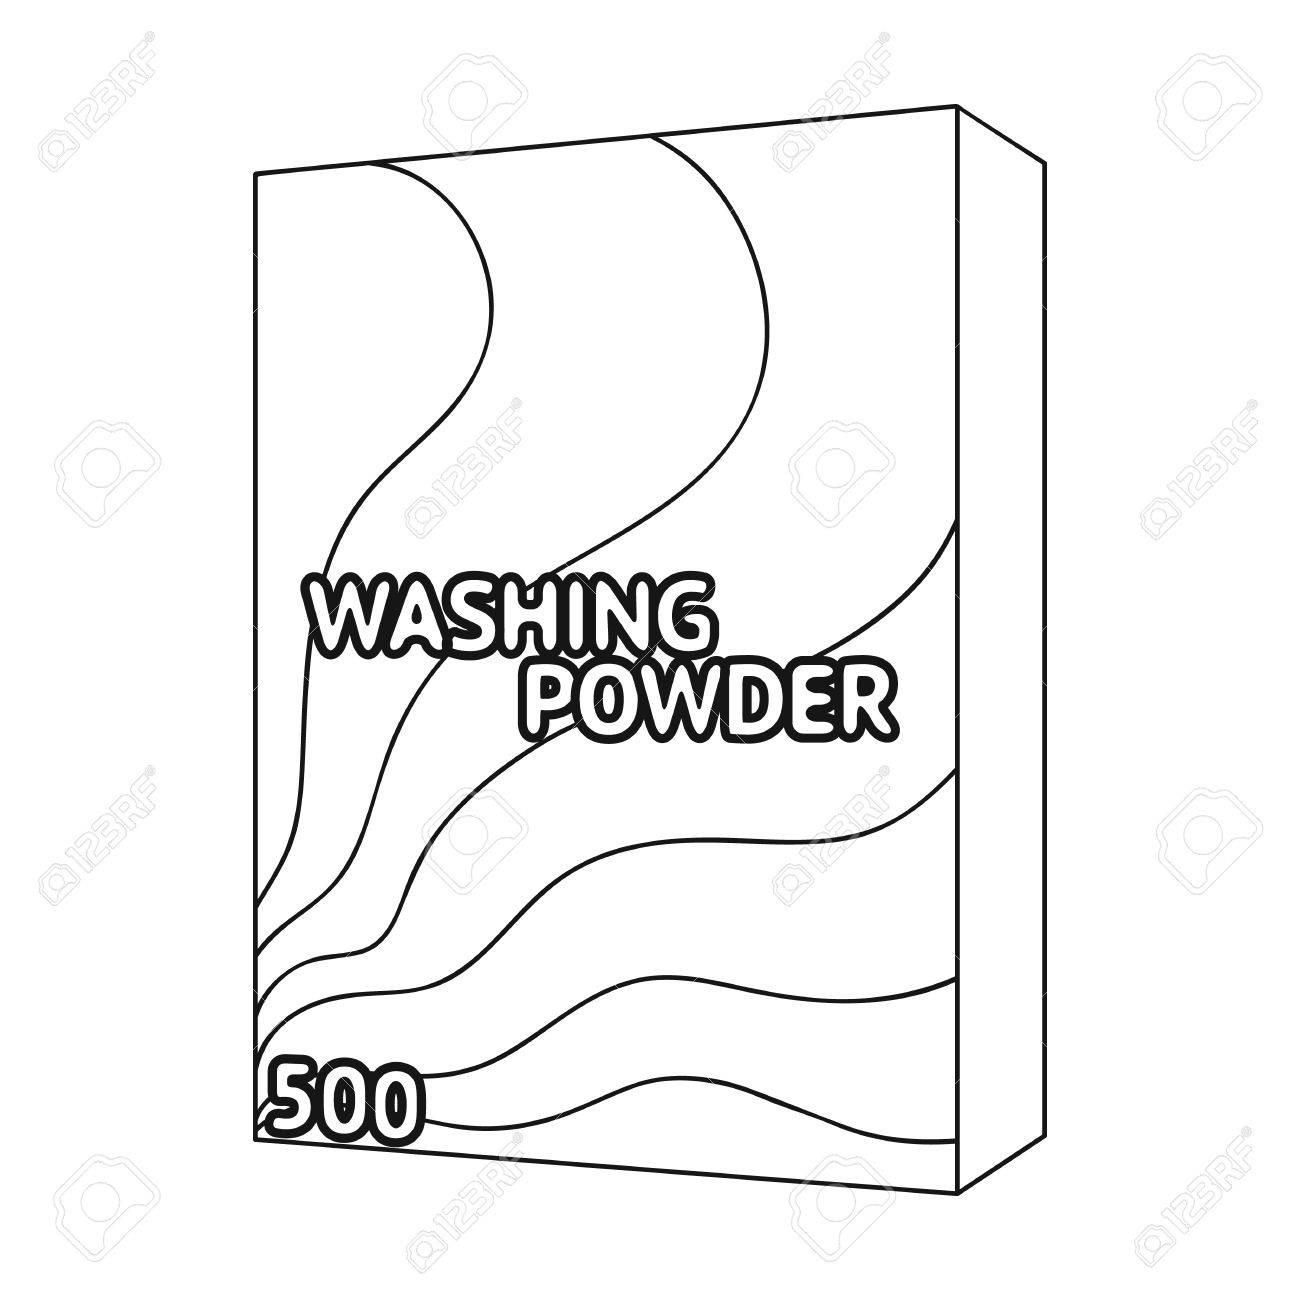 Washing powder dry cleaning single icon in black style vector dry cleaning single icon in black style vector symbol stock illustration stock buycottarizona Choice Image